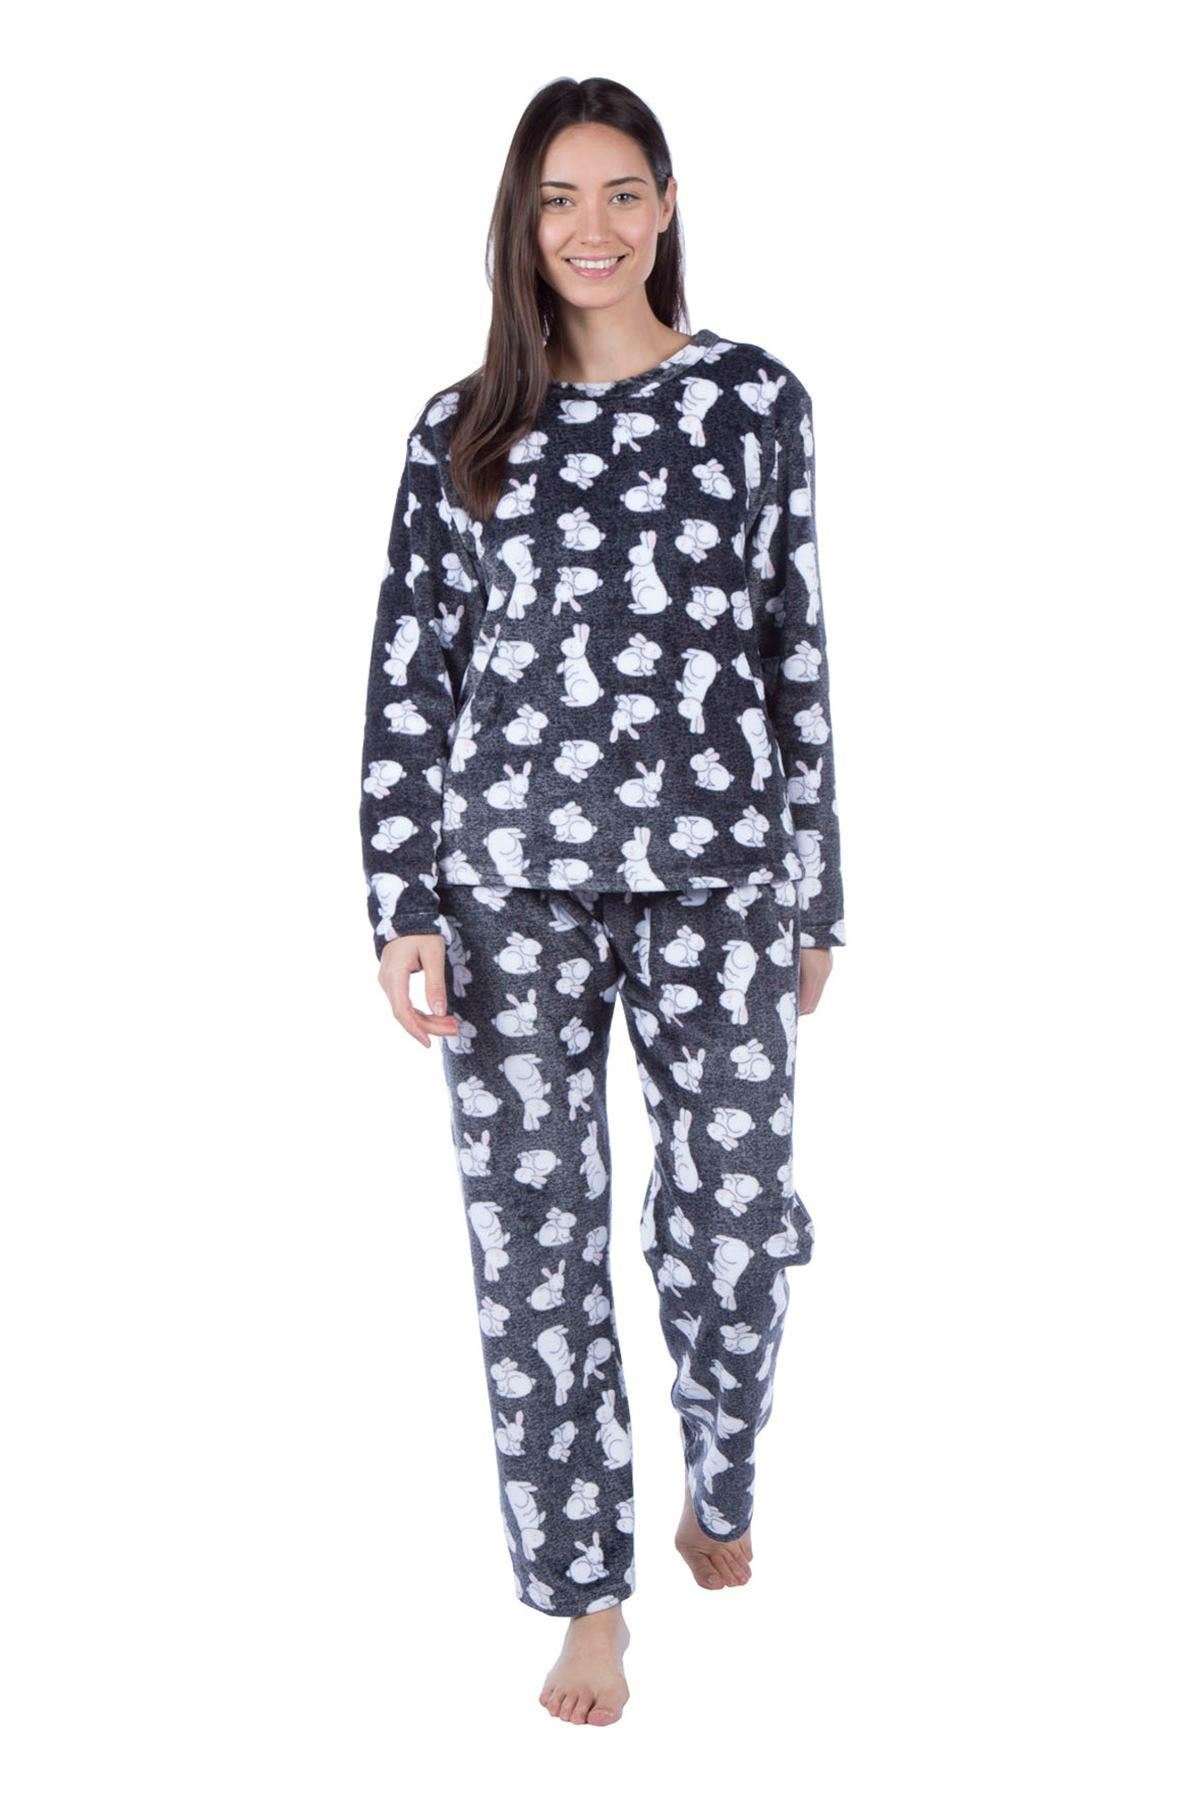 53879c0ce5 Ladies Flannel Fleece Pyjama Set Long Sleeve Ruby Rabit Crewneck ...